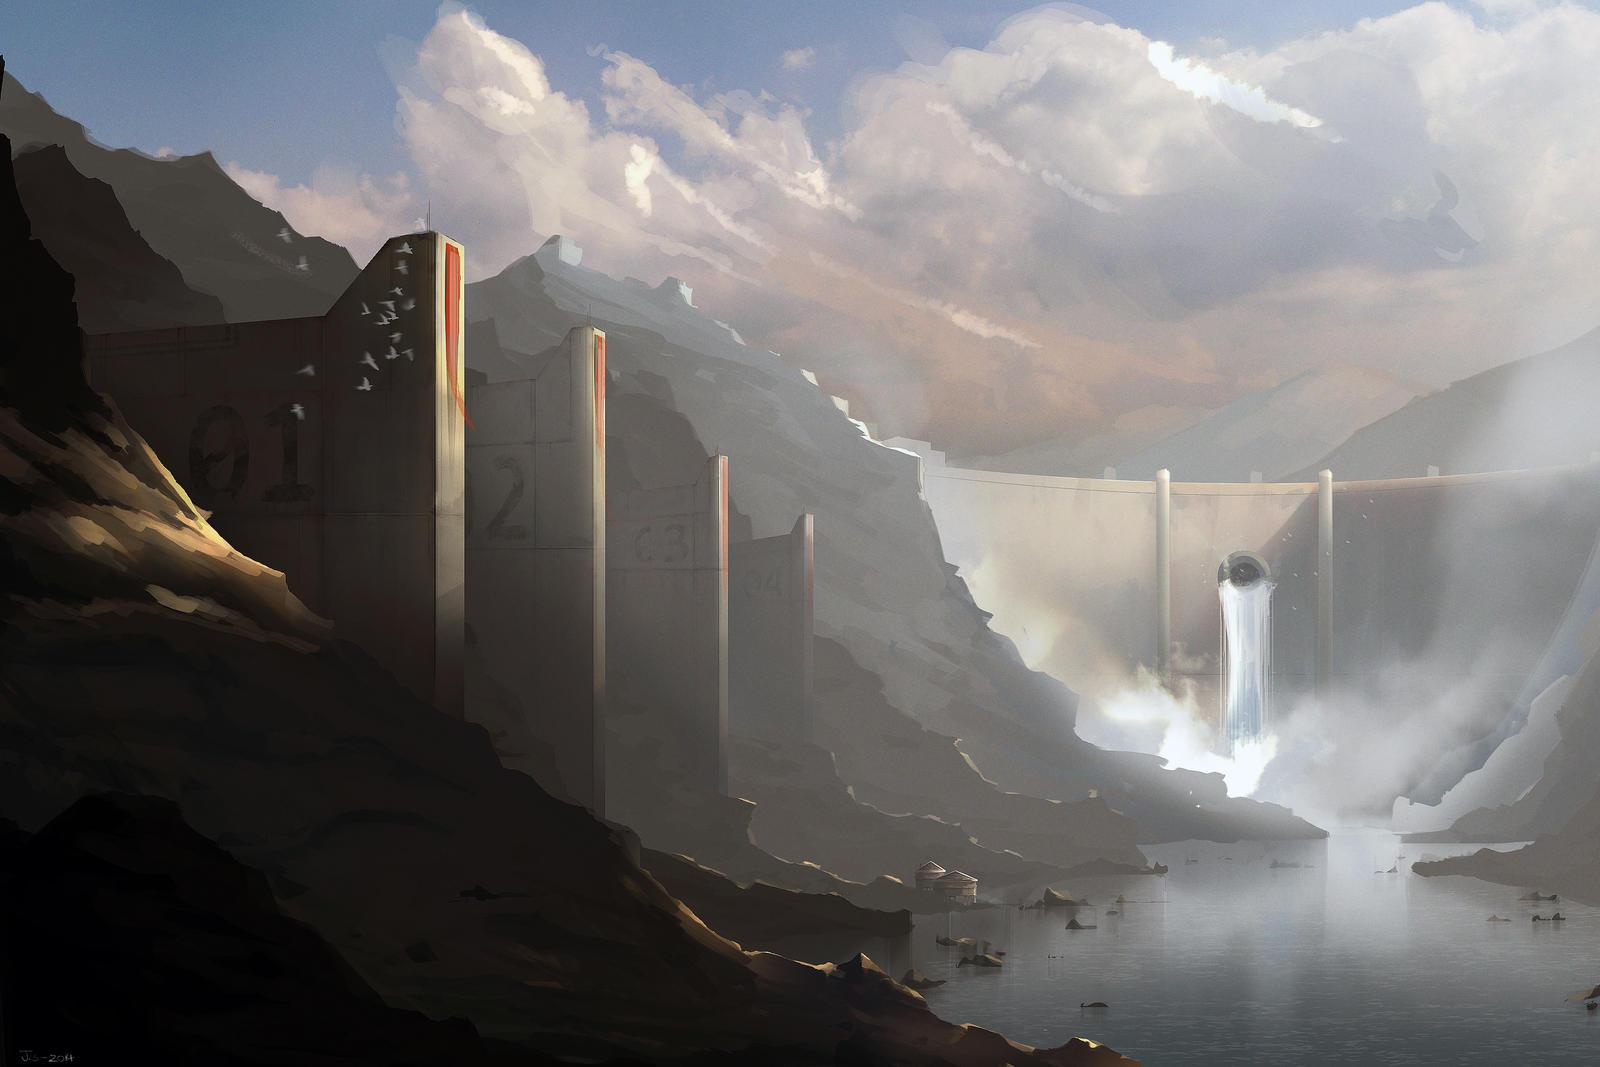 Below the Dam by Nyius